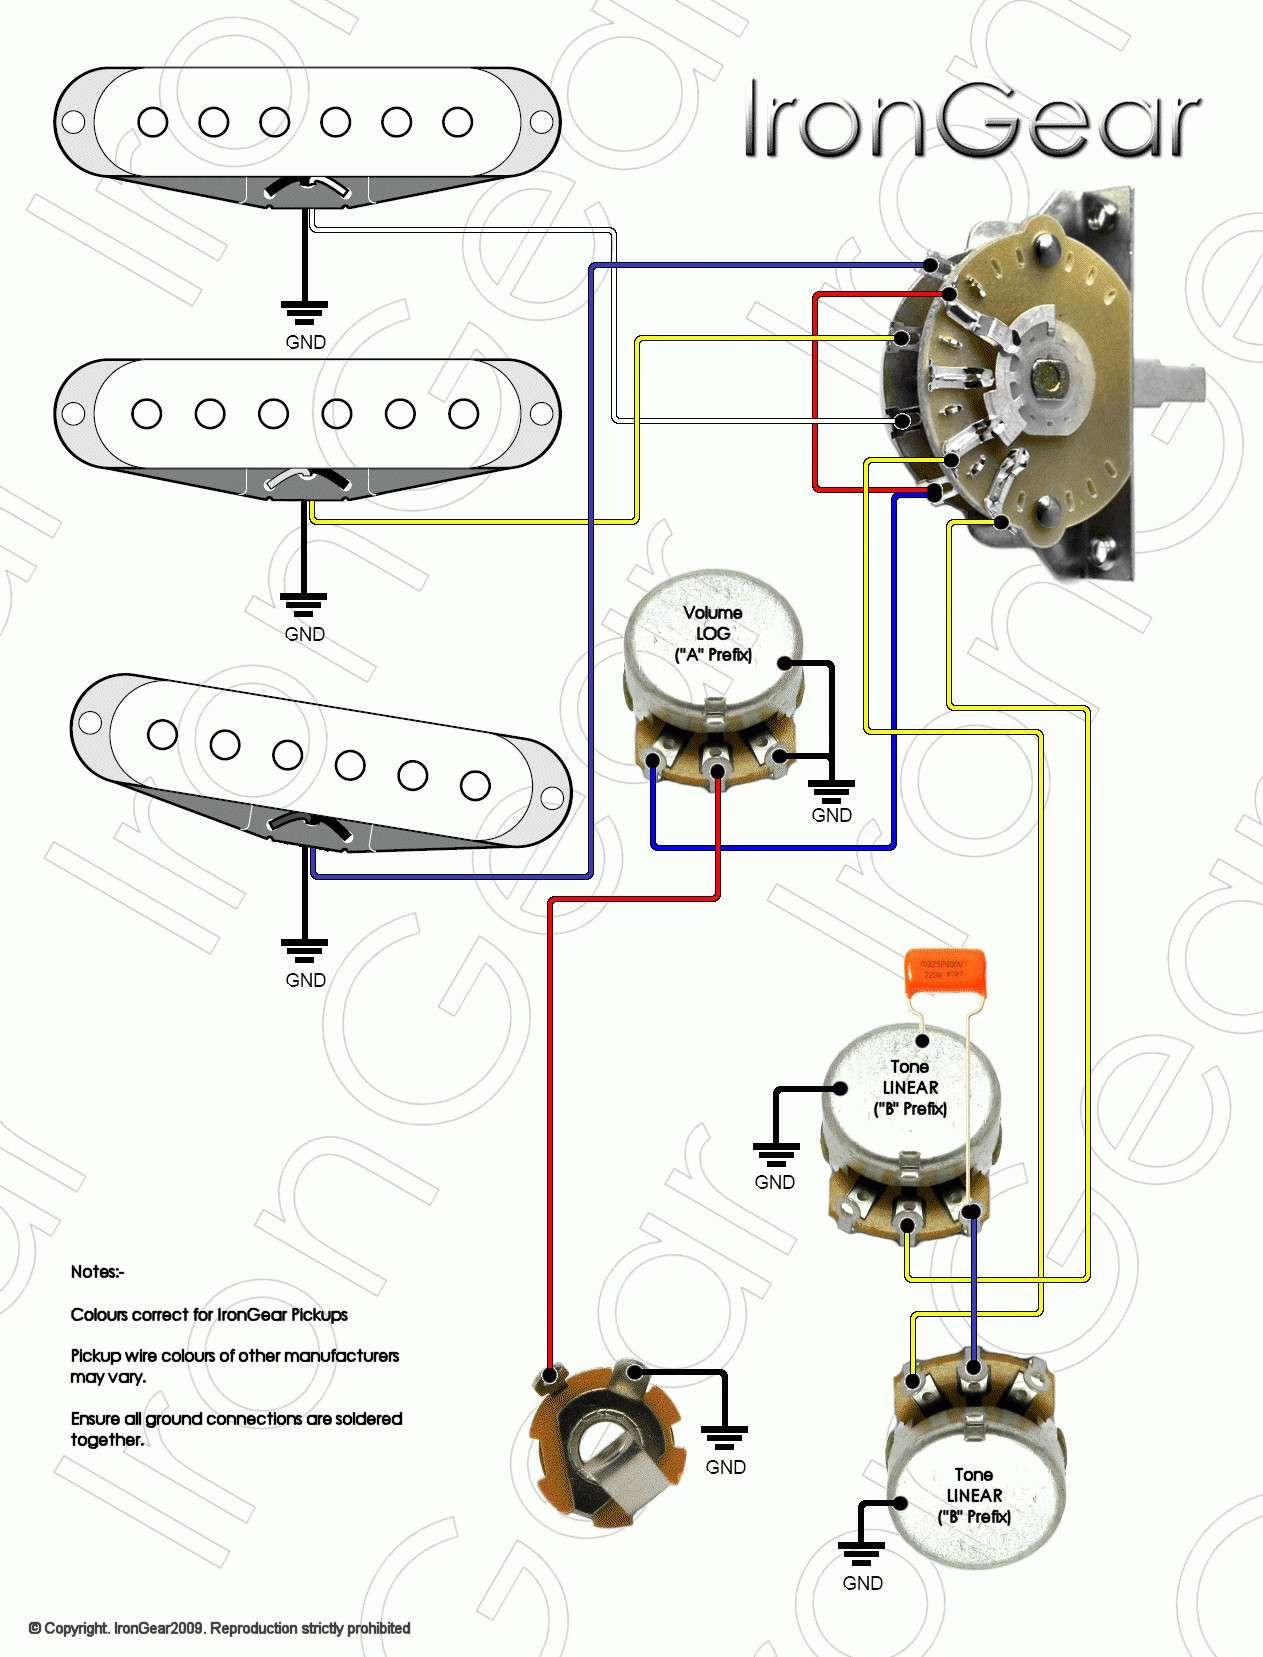 medium resolution of wiring diagram 3 way switch elegant wiring diagram for 5 way guitarwiring diagram 3 way switch